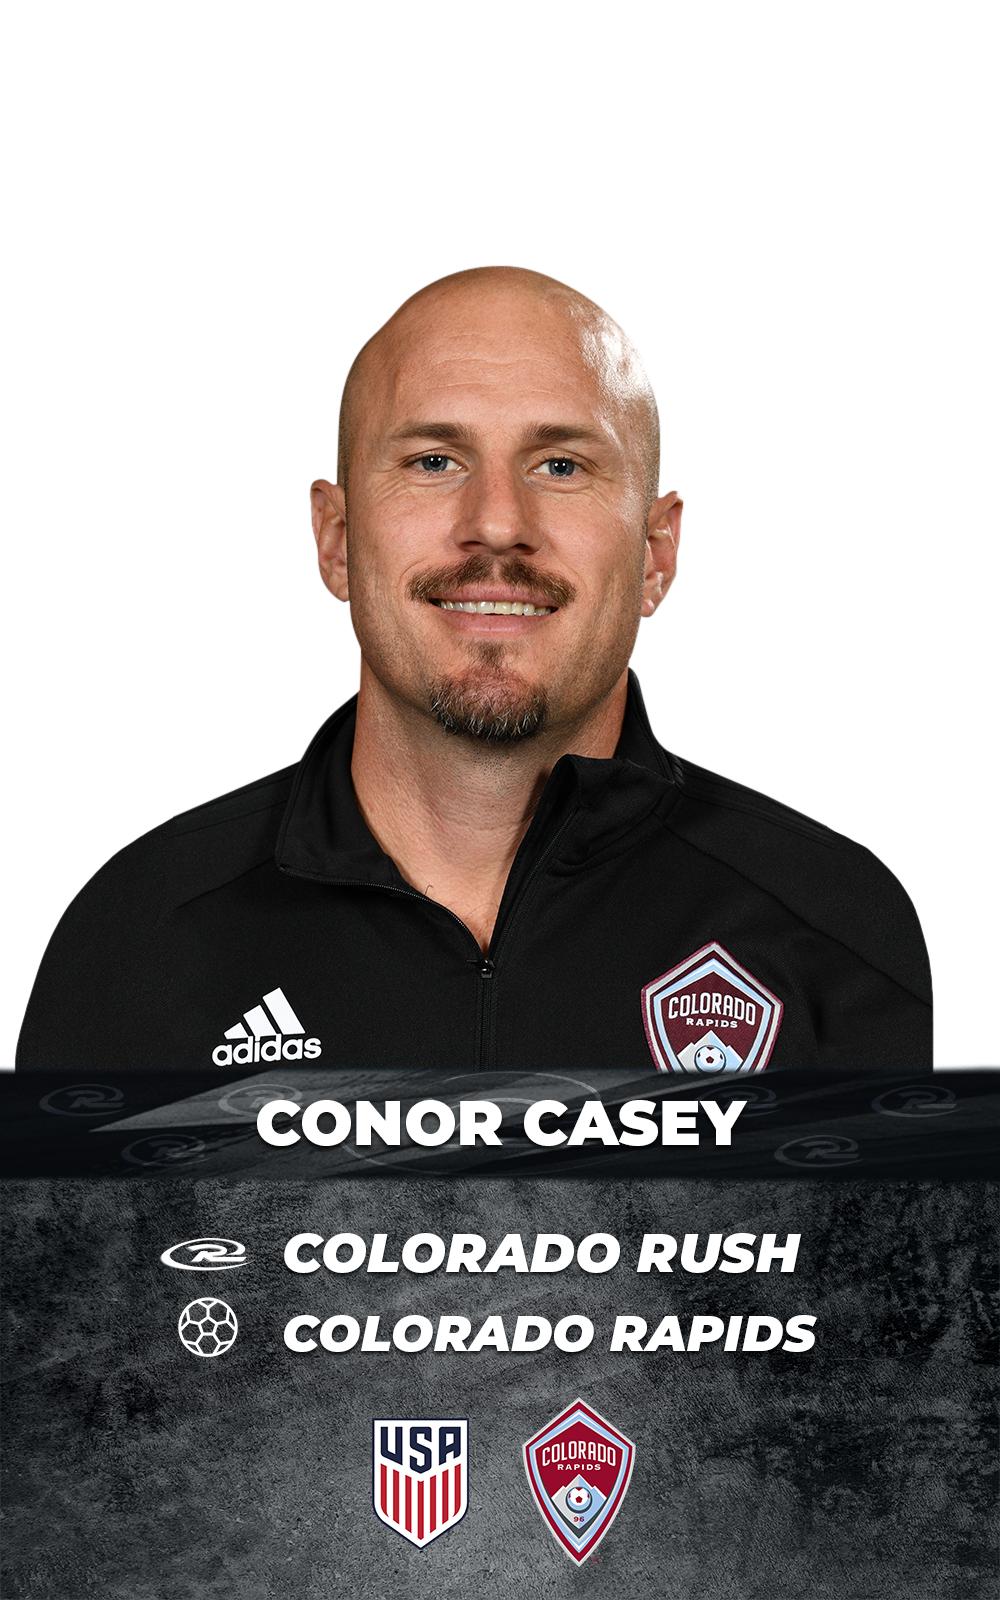 Conor-Casey